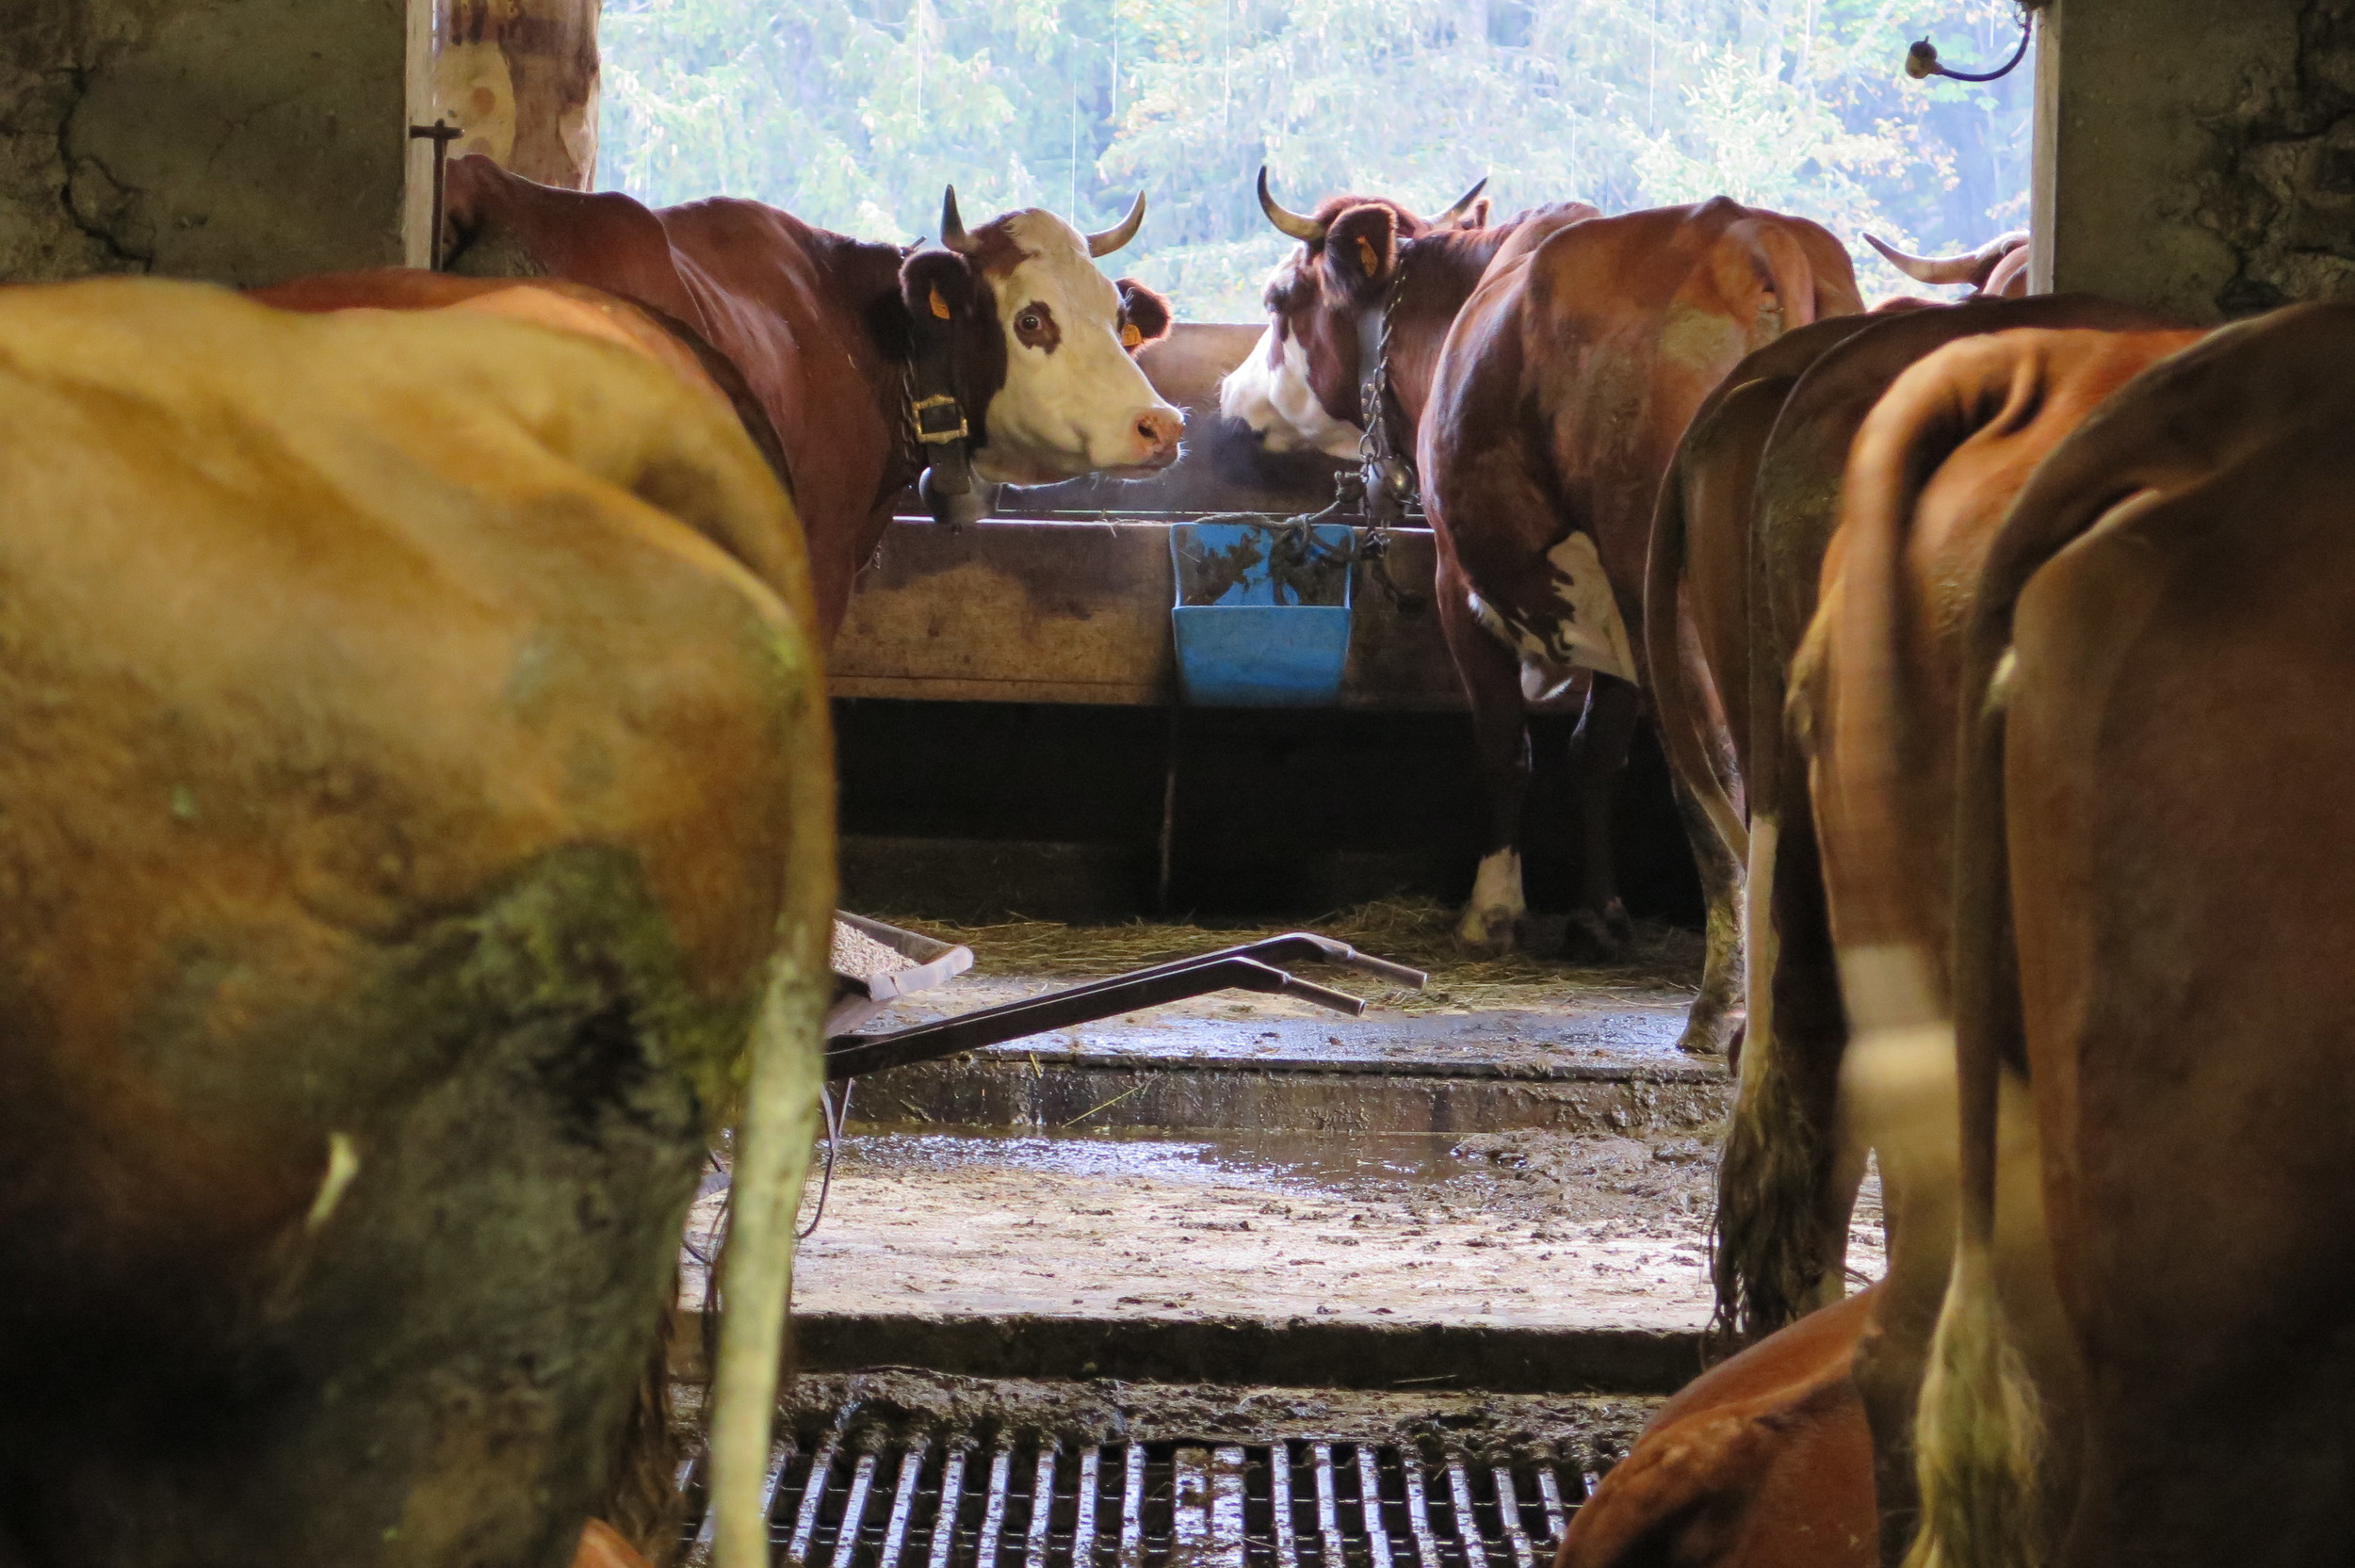 Abondance cows